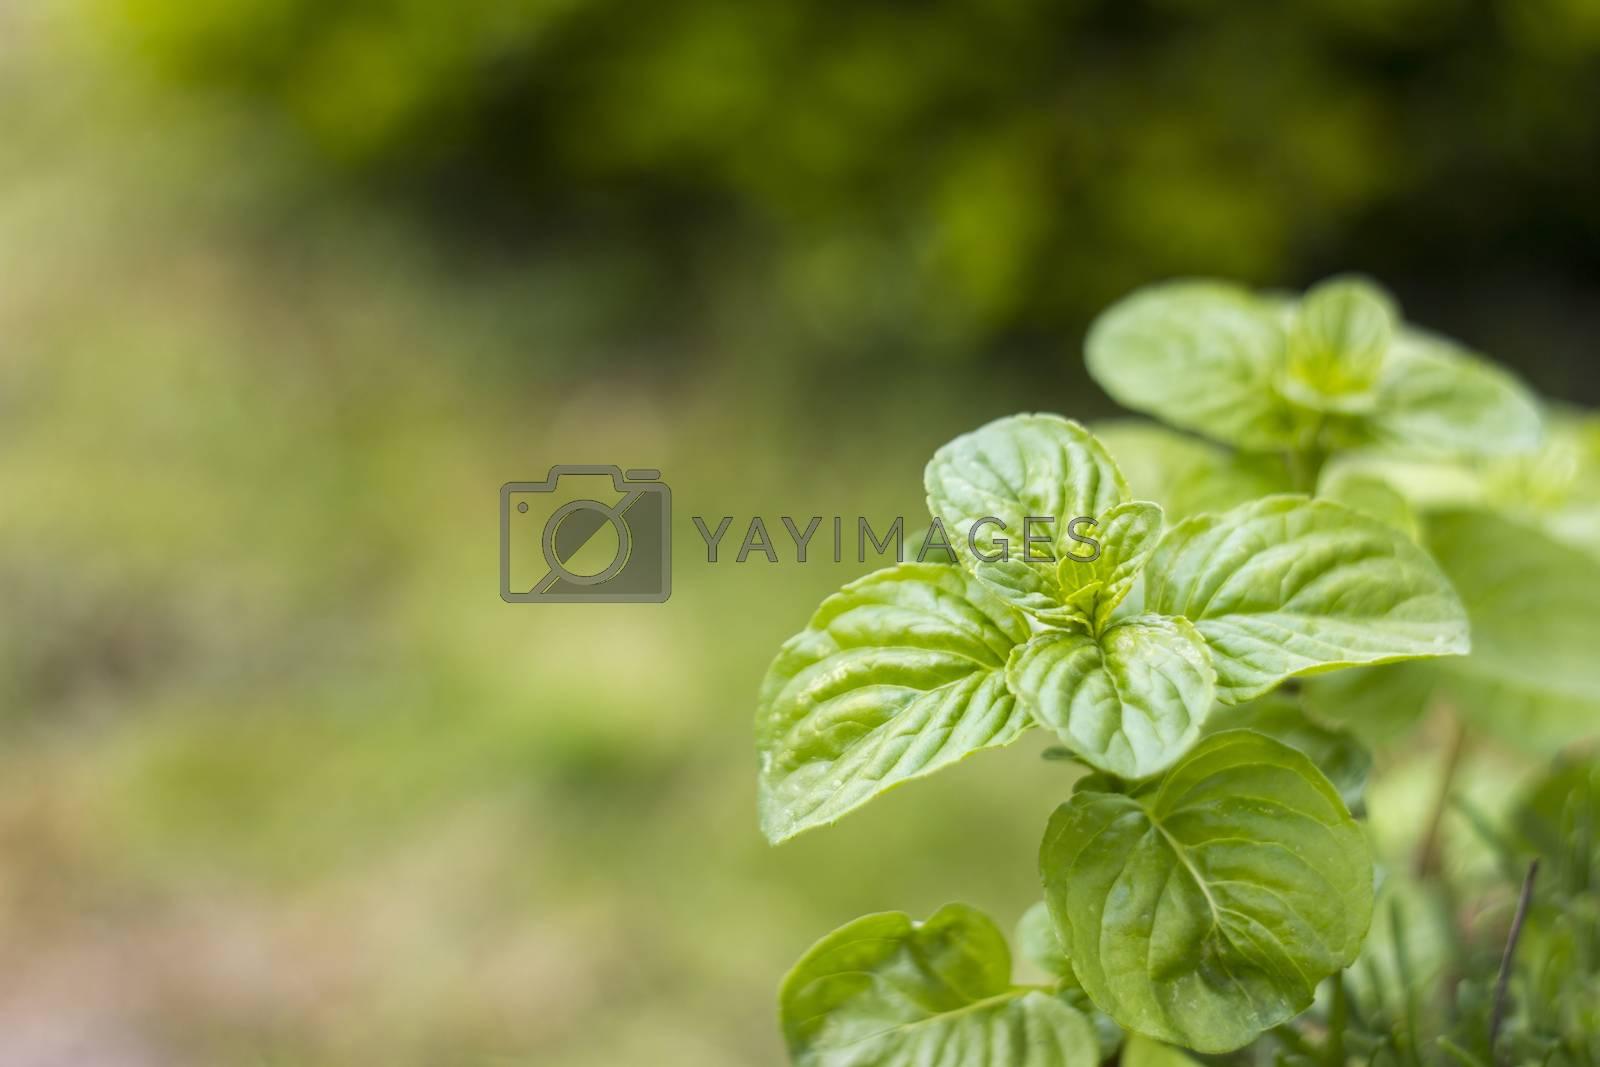 Mint plant grown at garden by miradrozdowski